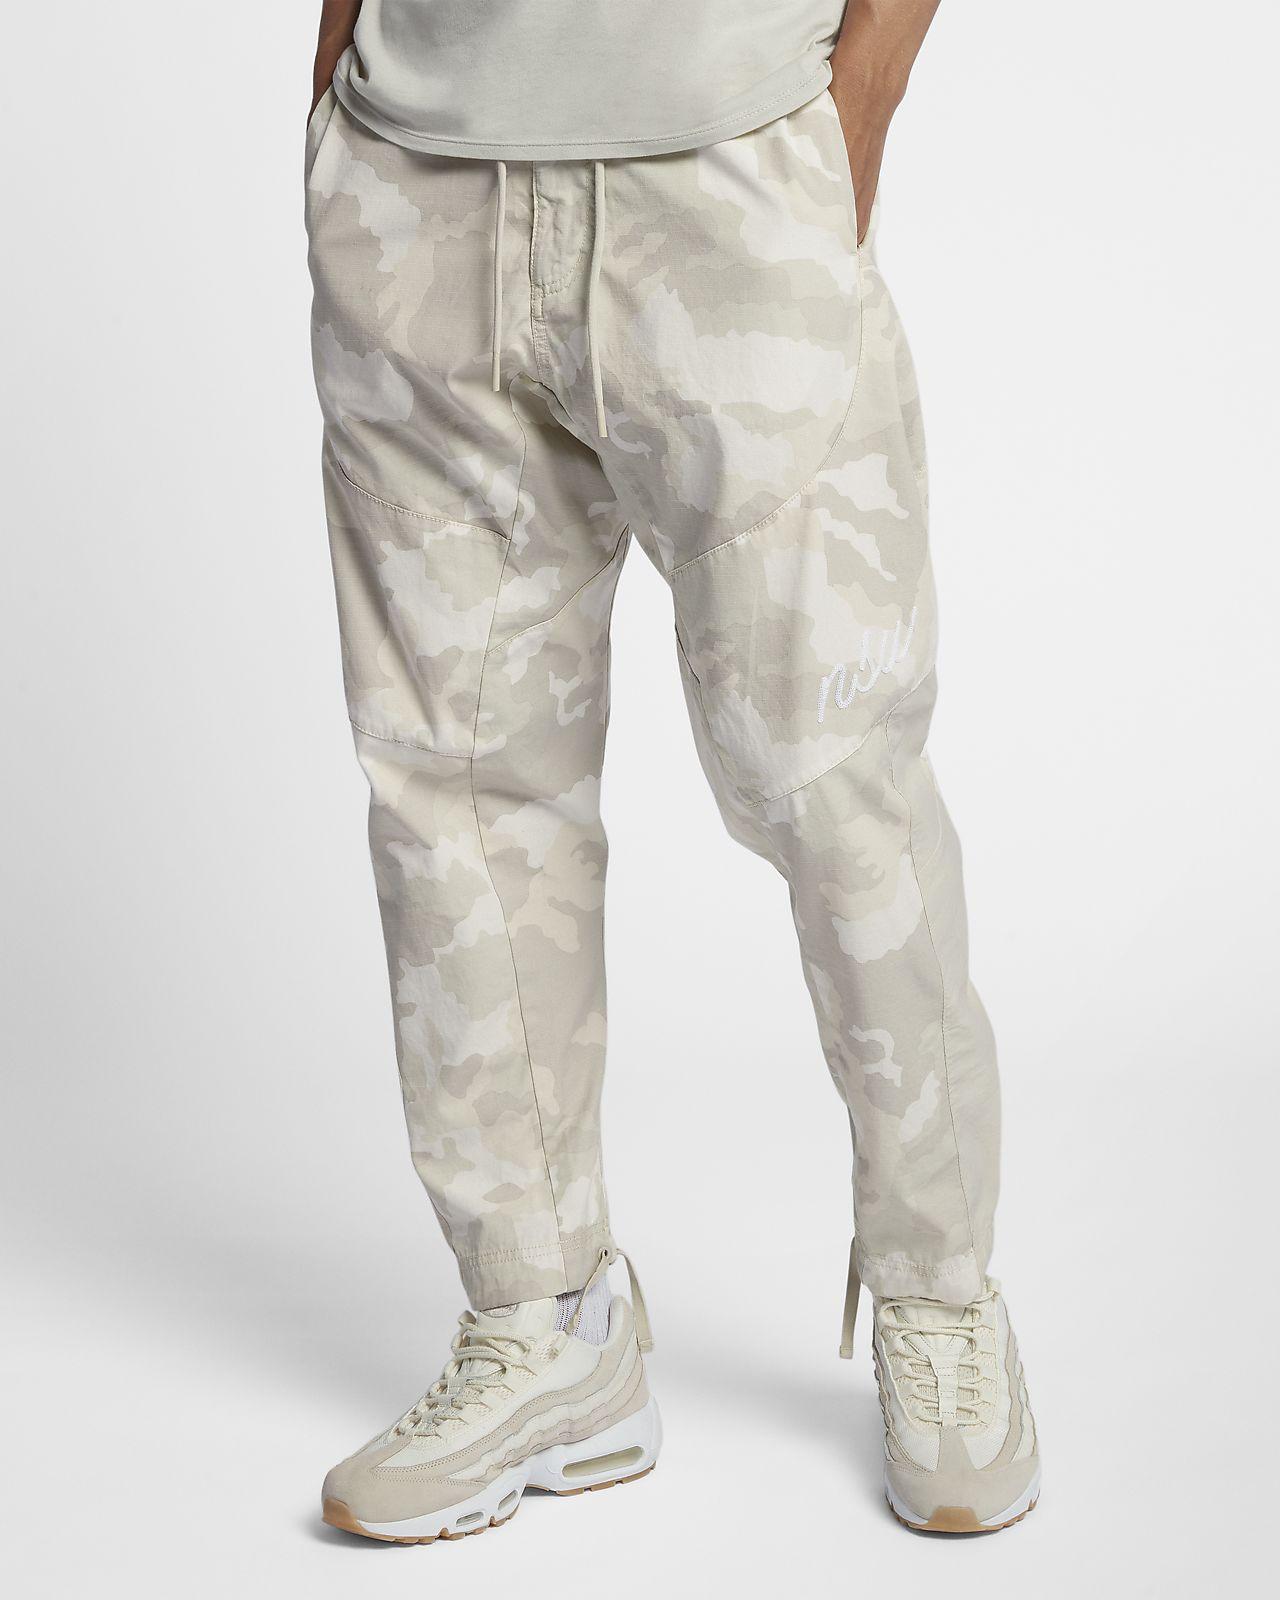 1813a088b Nike Sportswear NSW Men s Woven Camo Joggers. Nike.com GB